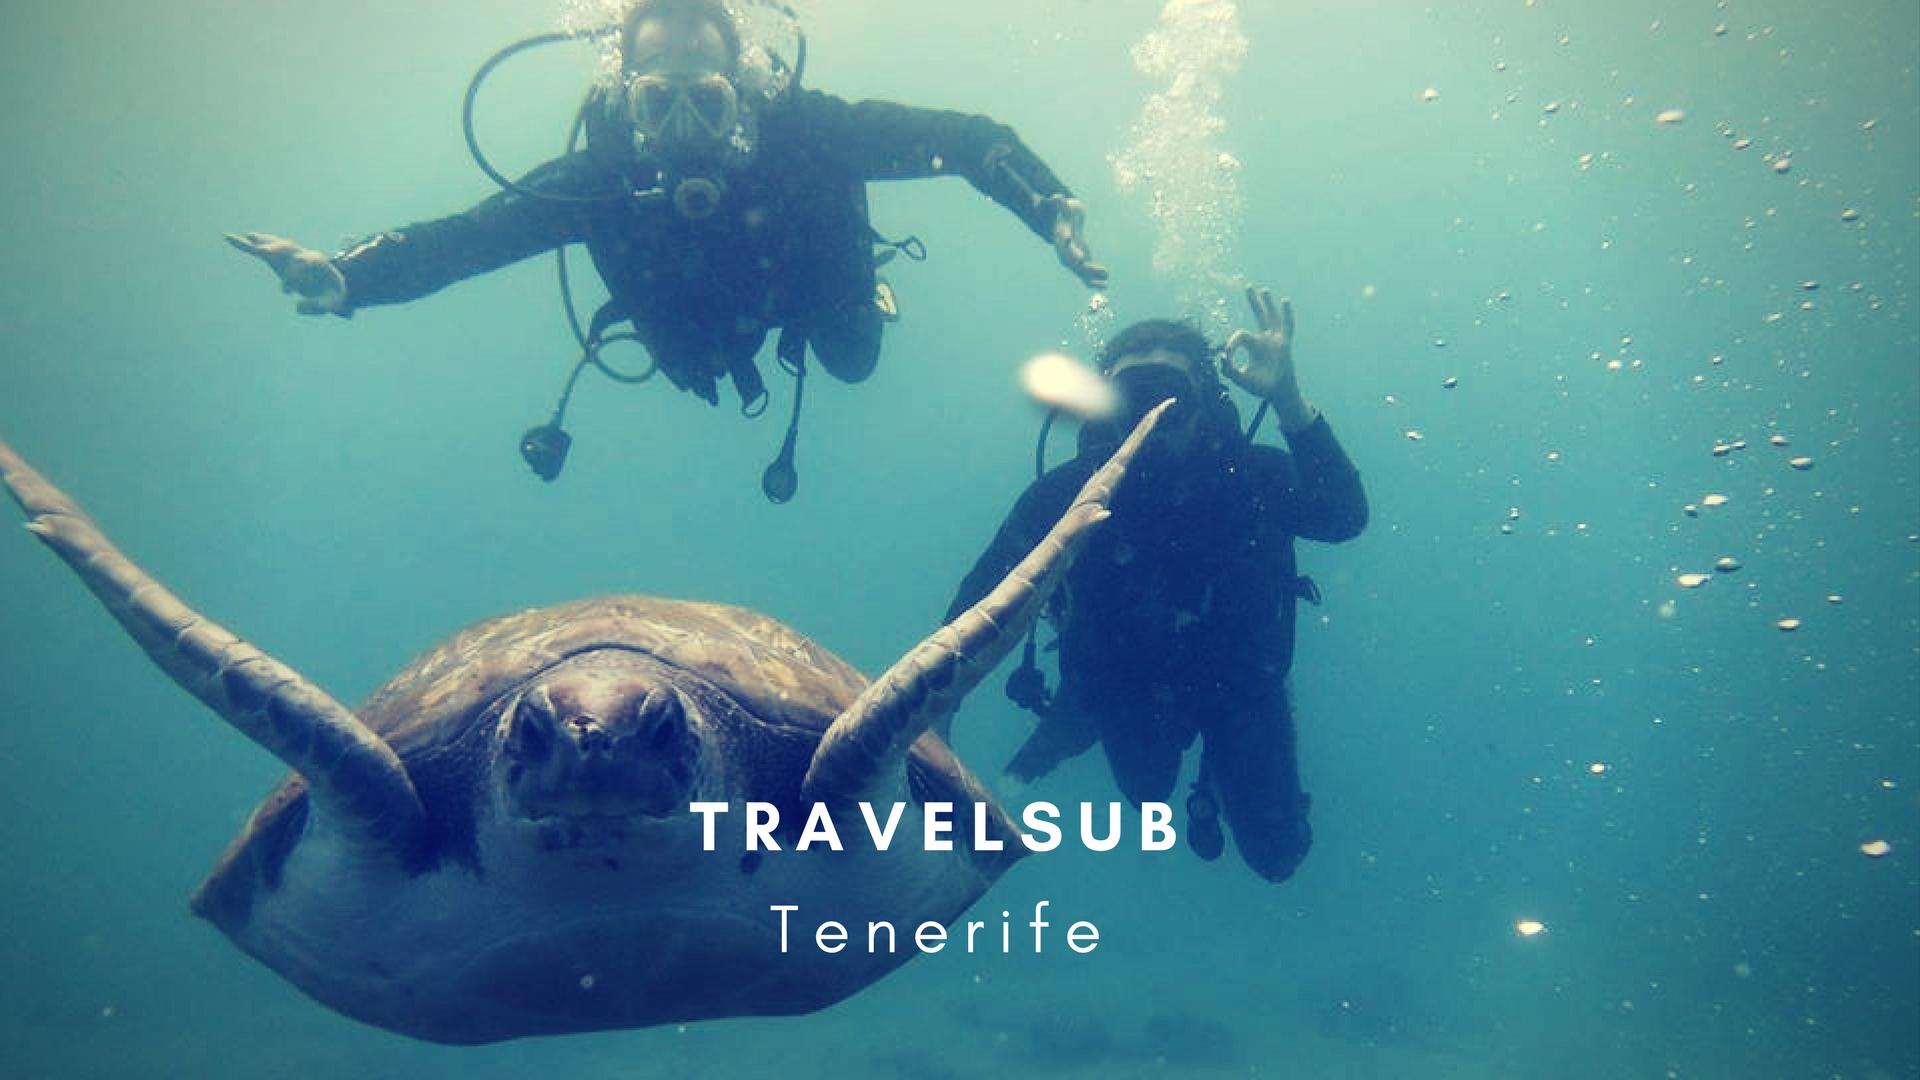 TravelSub Tenerife